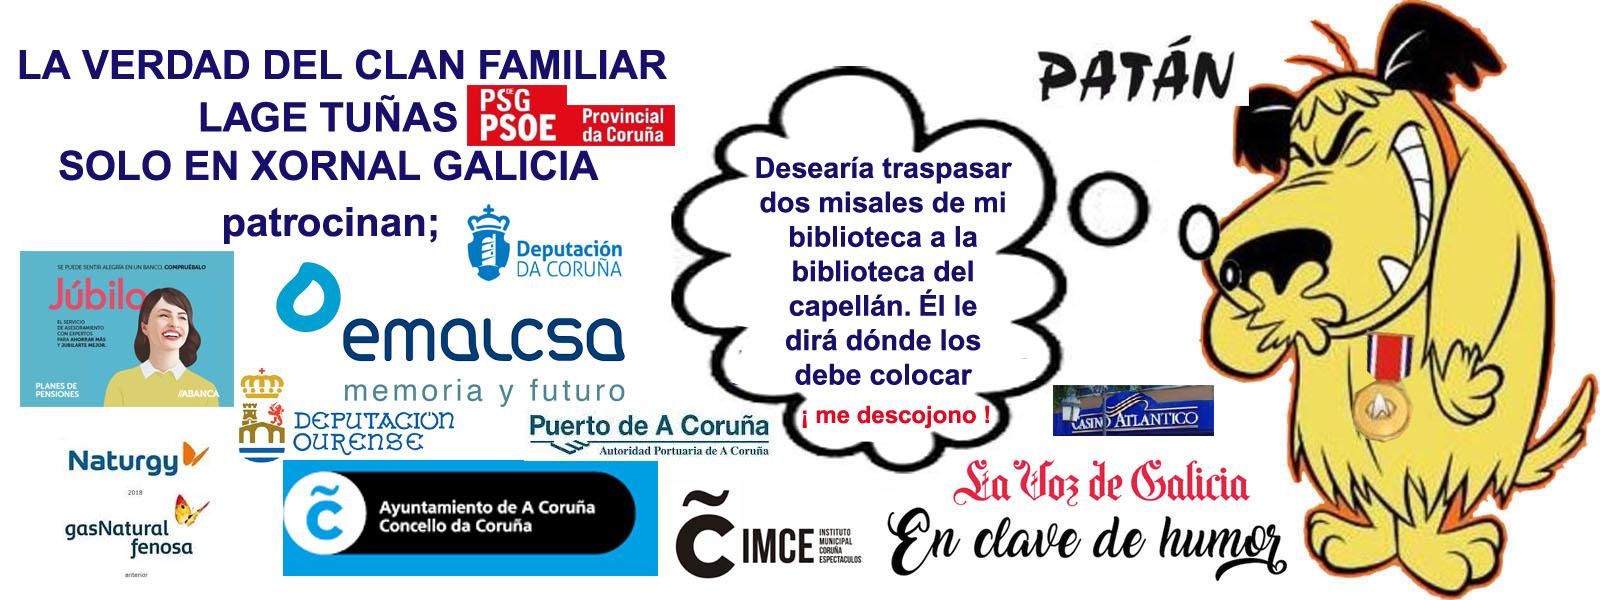 "LAGE TUÑAS TRATA A LOS CIUDADANOS/AS DE A CORUÑA DE SUS CLIENTES PARA  ENTRARLES A ""SACO"" AL BOLSILLO. - Xornal Galicia | Xornal Galicia"